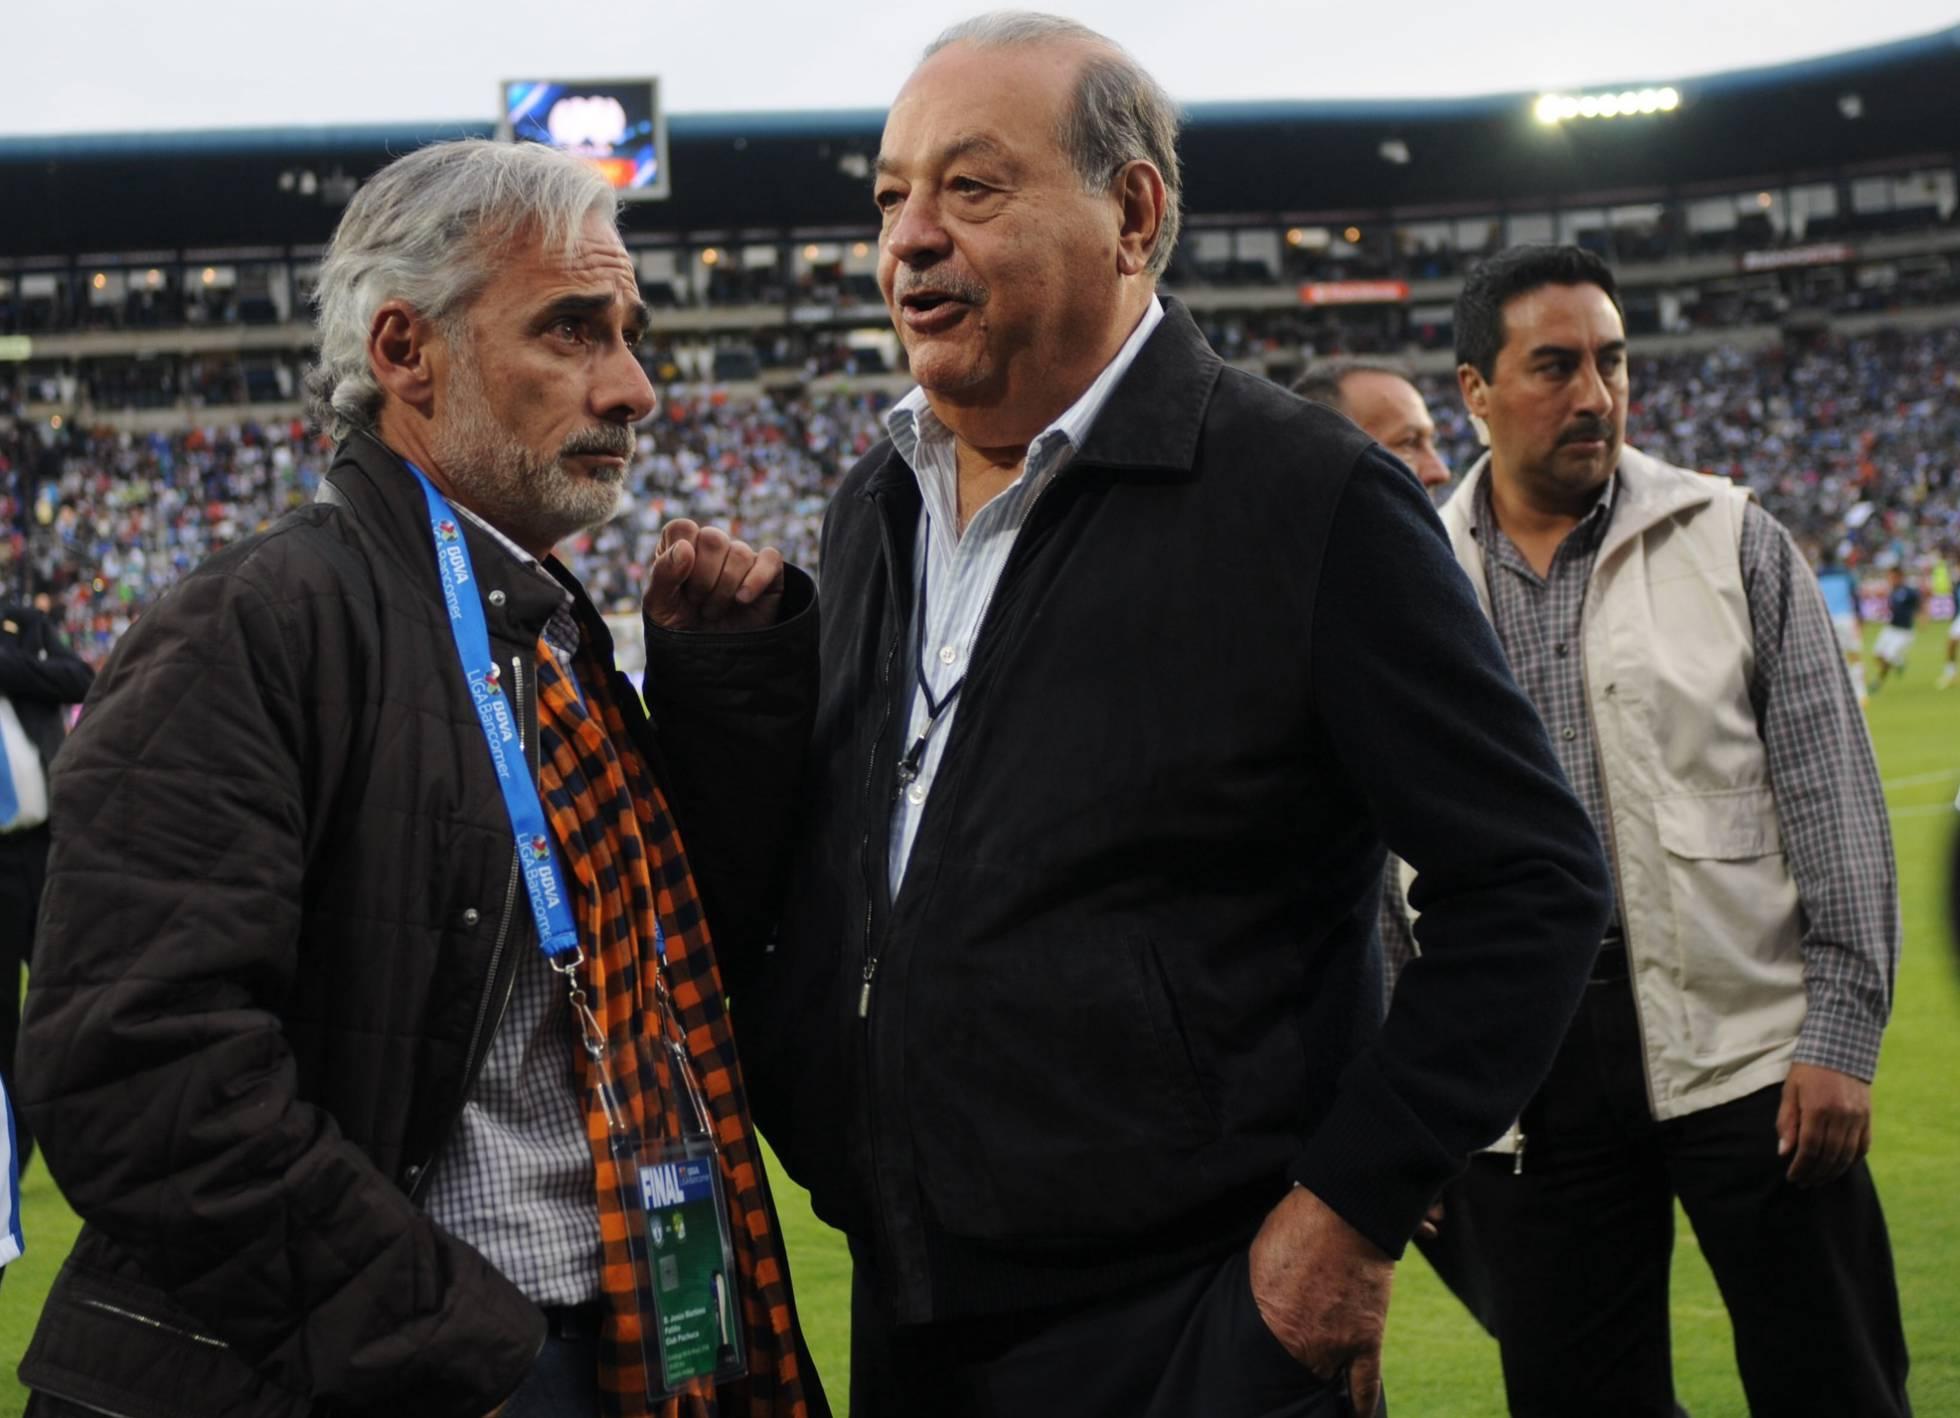 Jesus Martinez y Carlos Slim